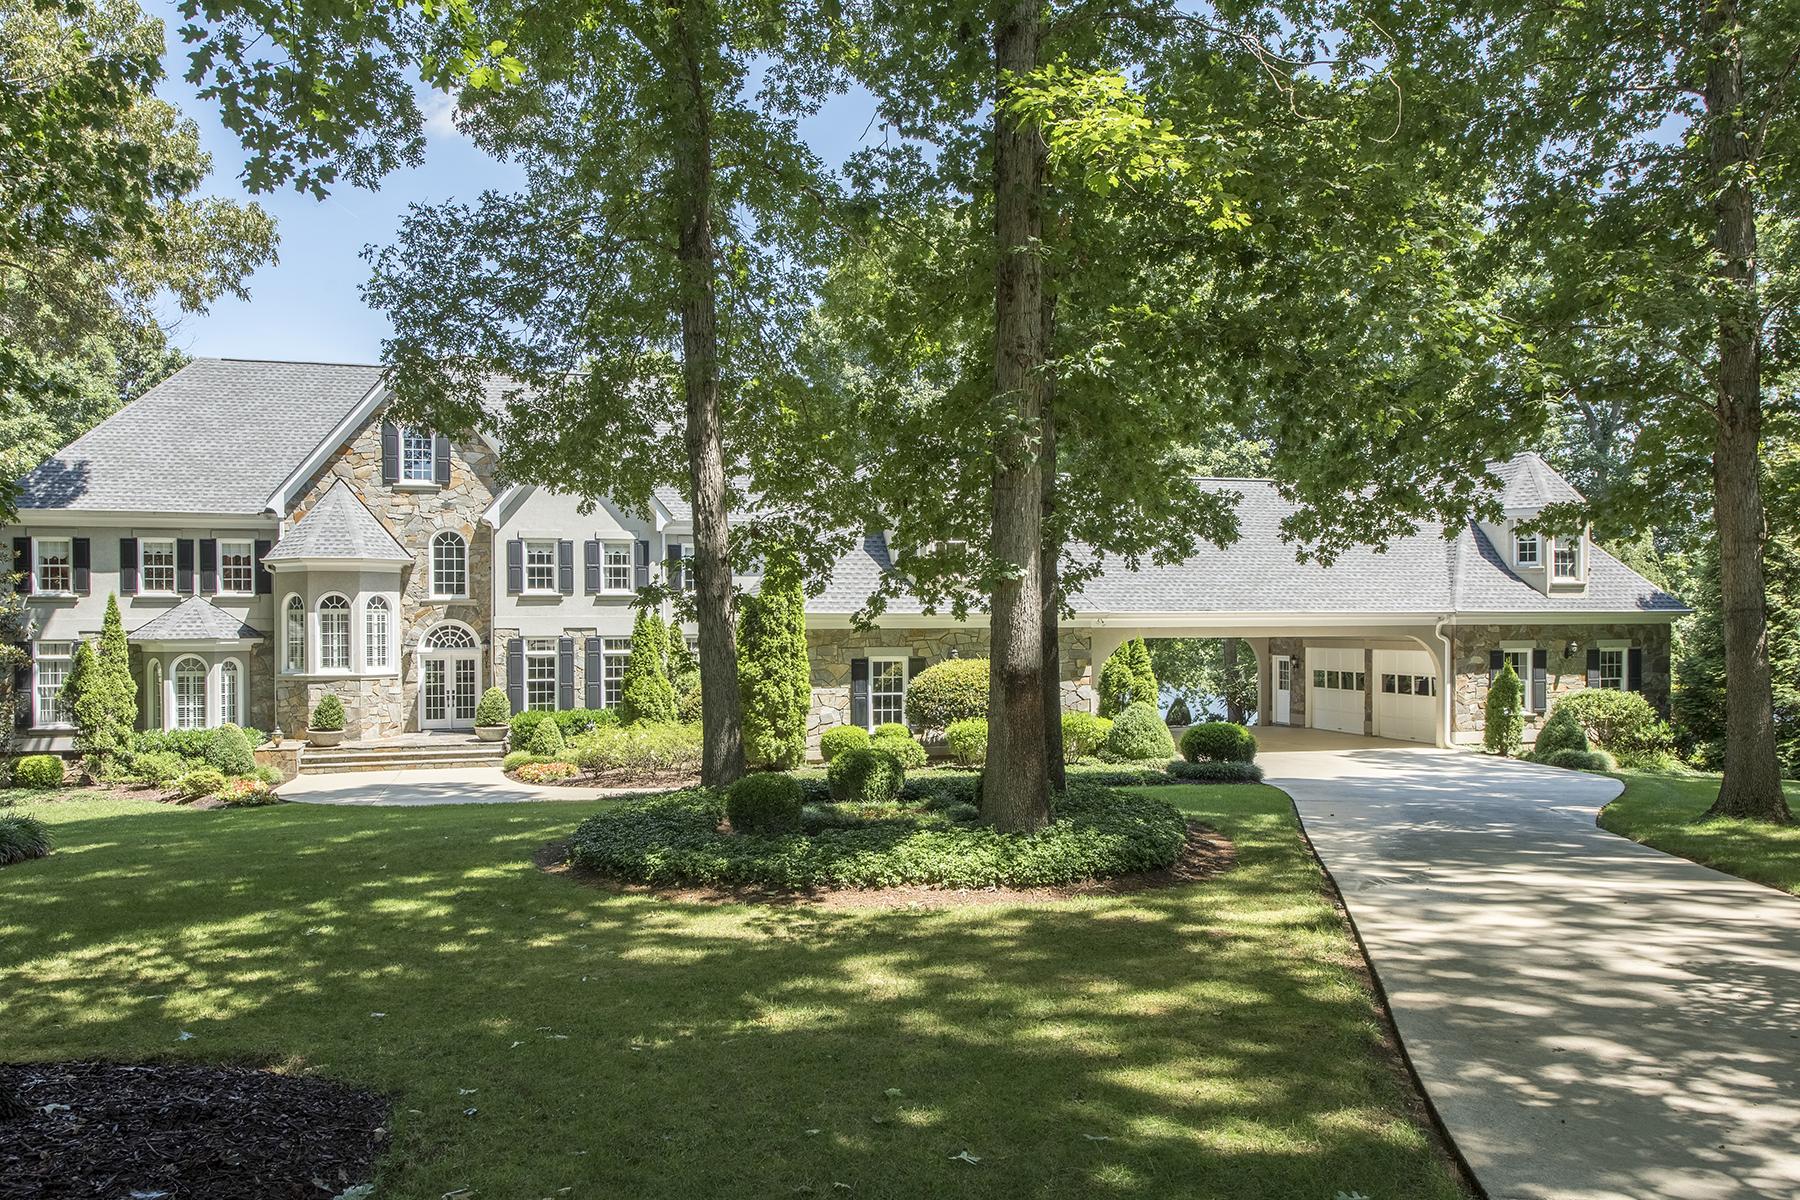 Single Family Homes για την Πώληση στο 3719 Heron Point Dr, Monroe, Βορεια Καρολινα 28110 Ηνωμένες Πολιτείες